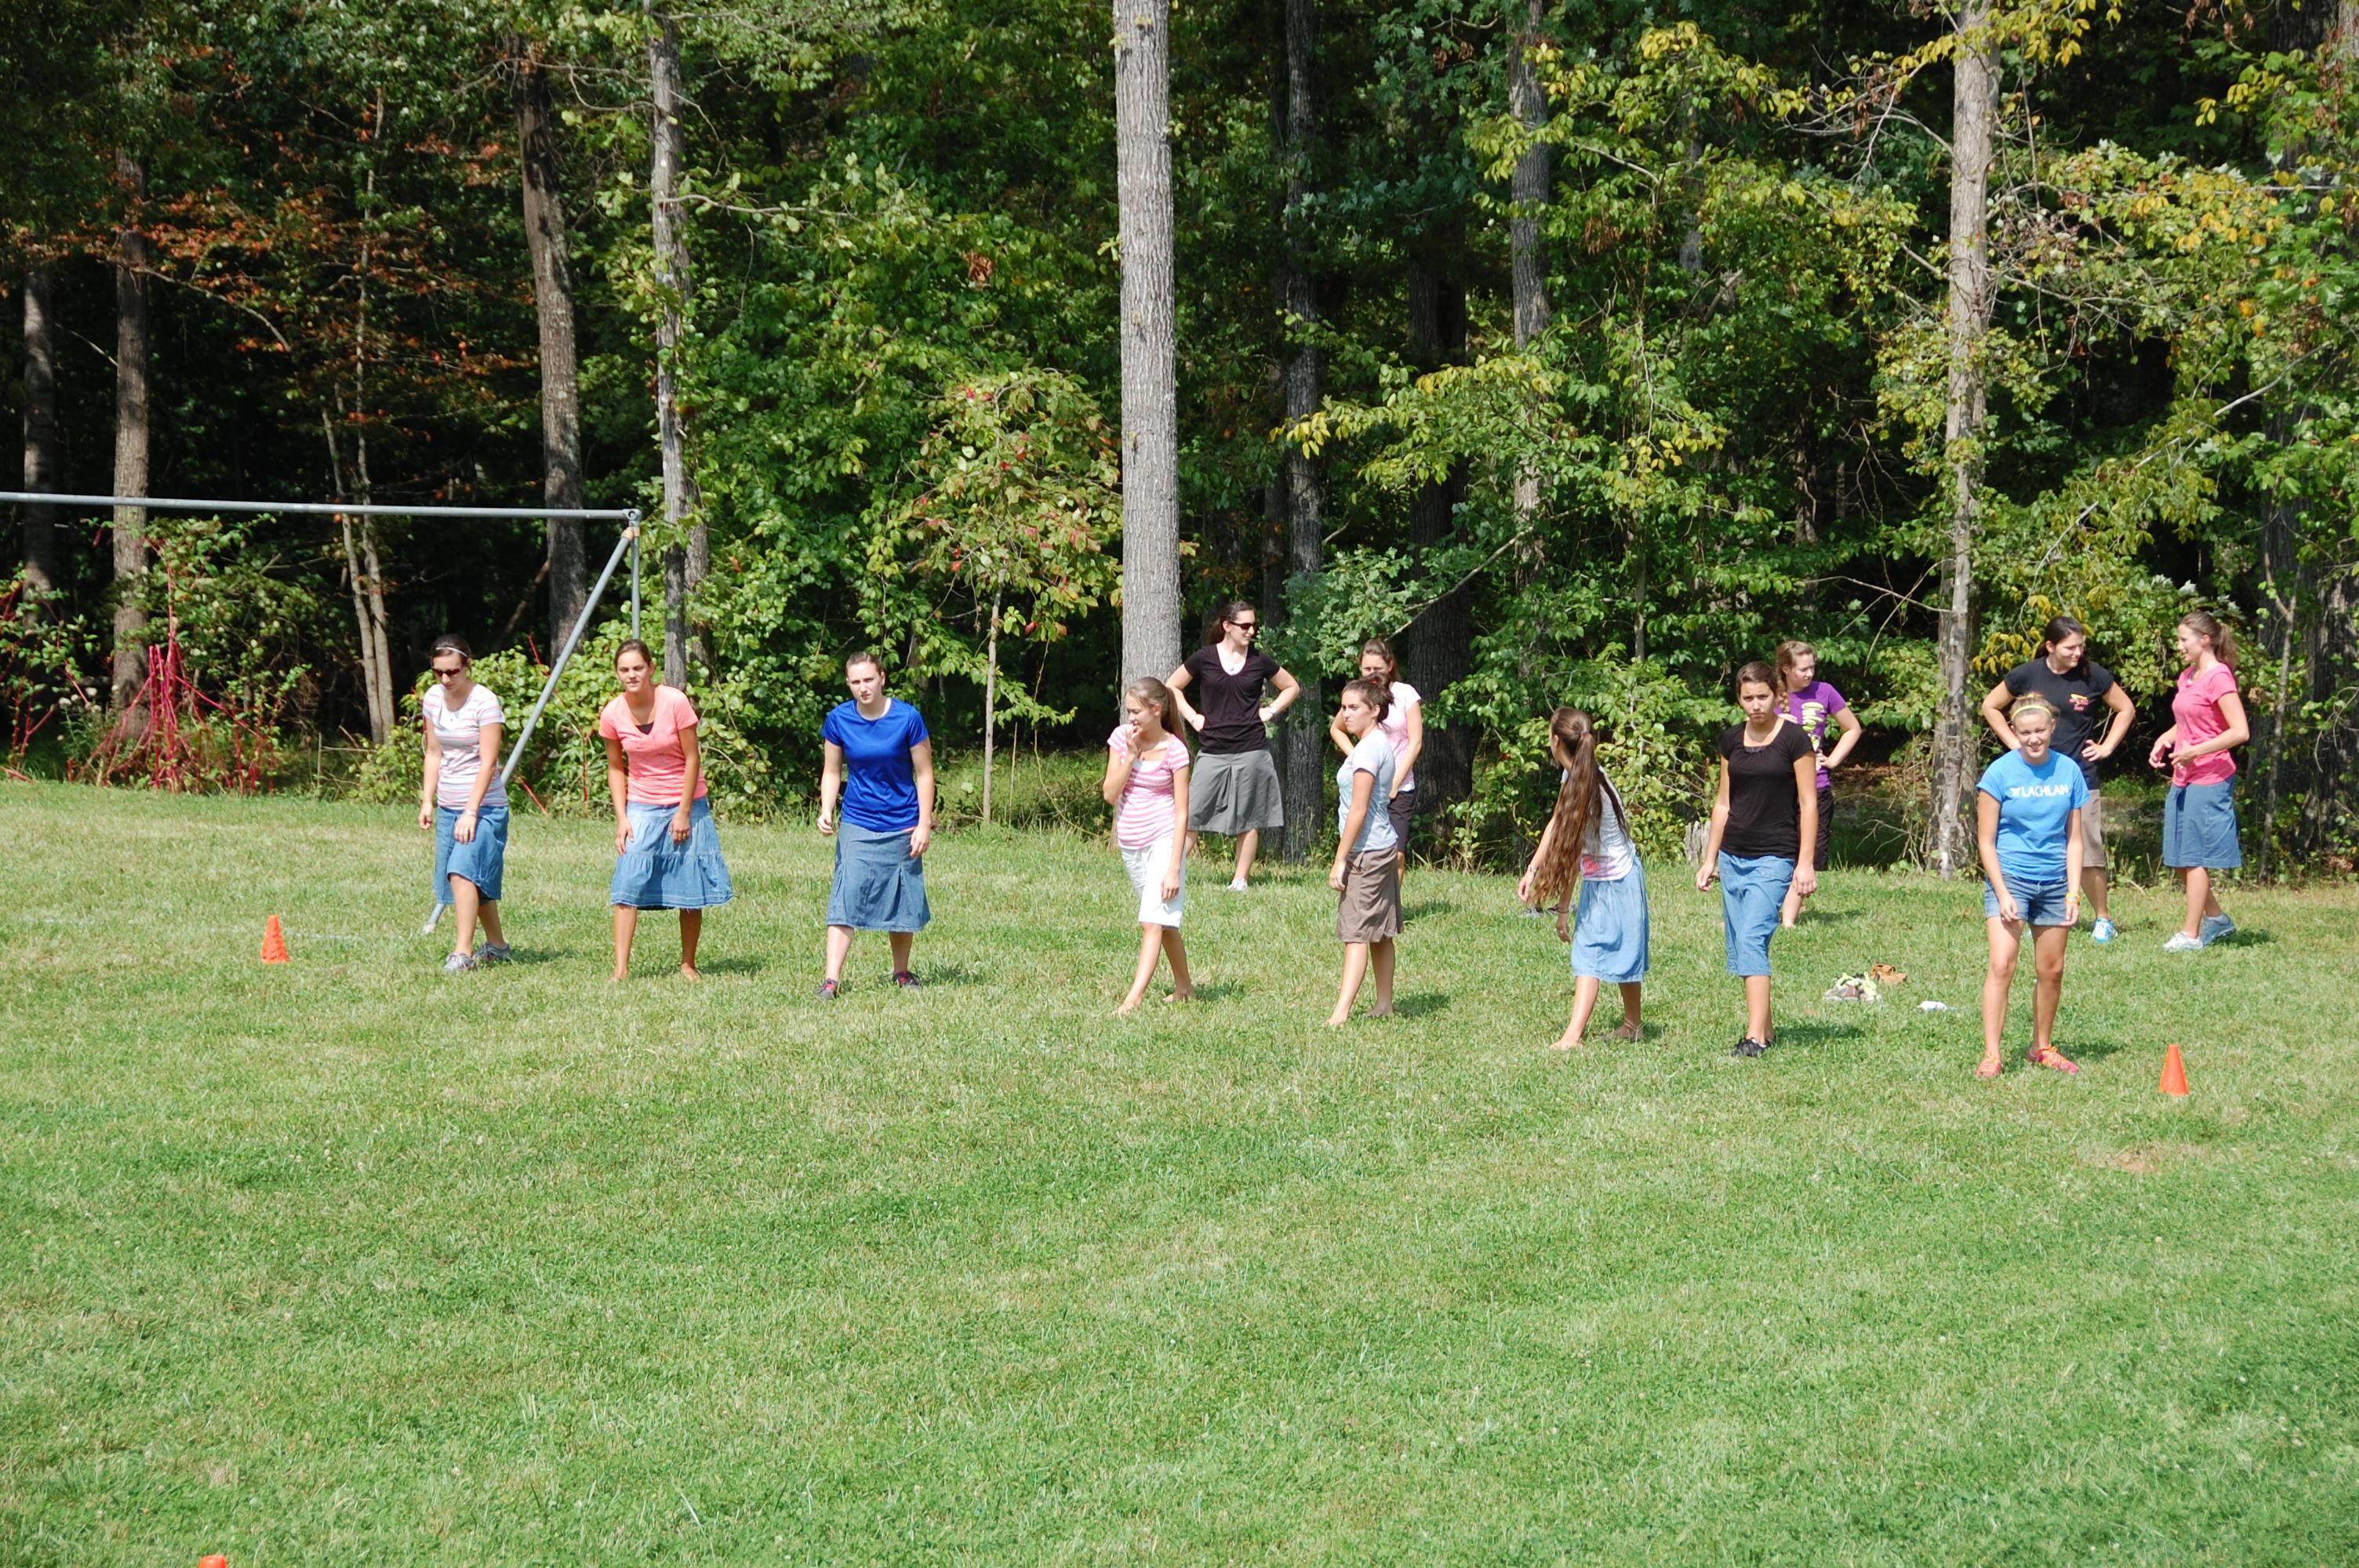 Girl's Runners #1: Brooke Seaborn, Shauna Rutt, Emily Steince, Mia Boyd, Erica Balderson, Bethany Corle, Rebecca Daigle, Connie Cotten